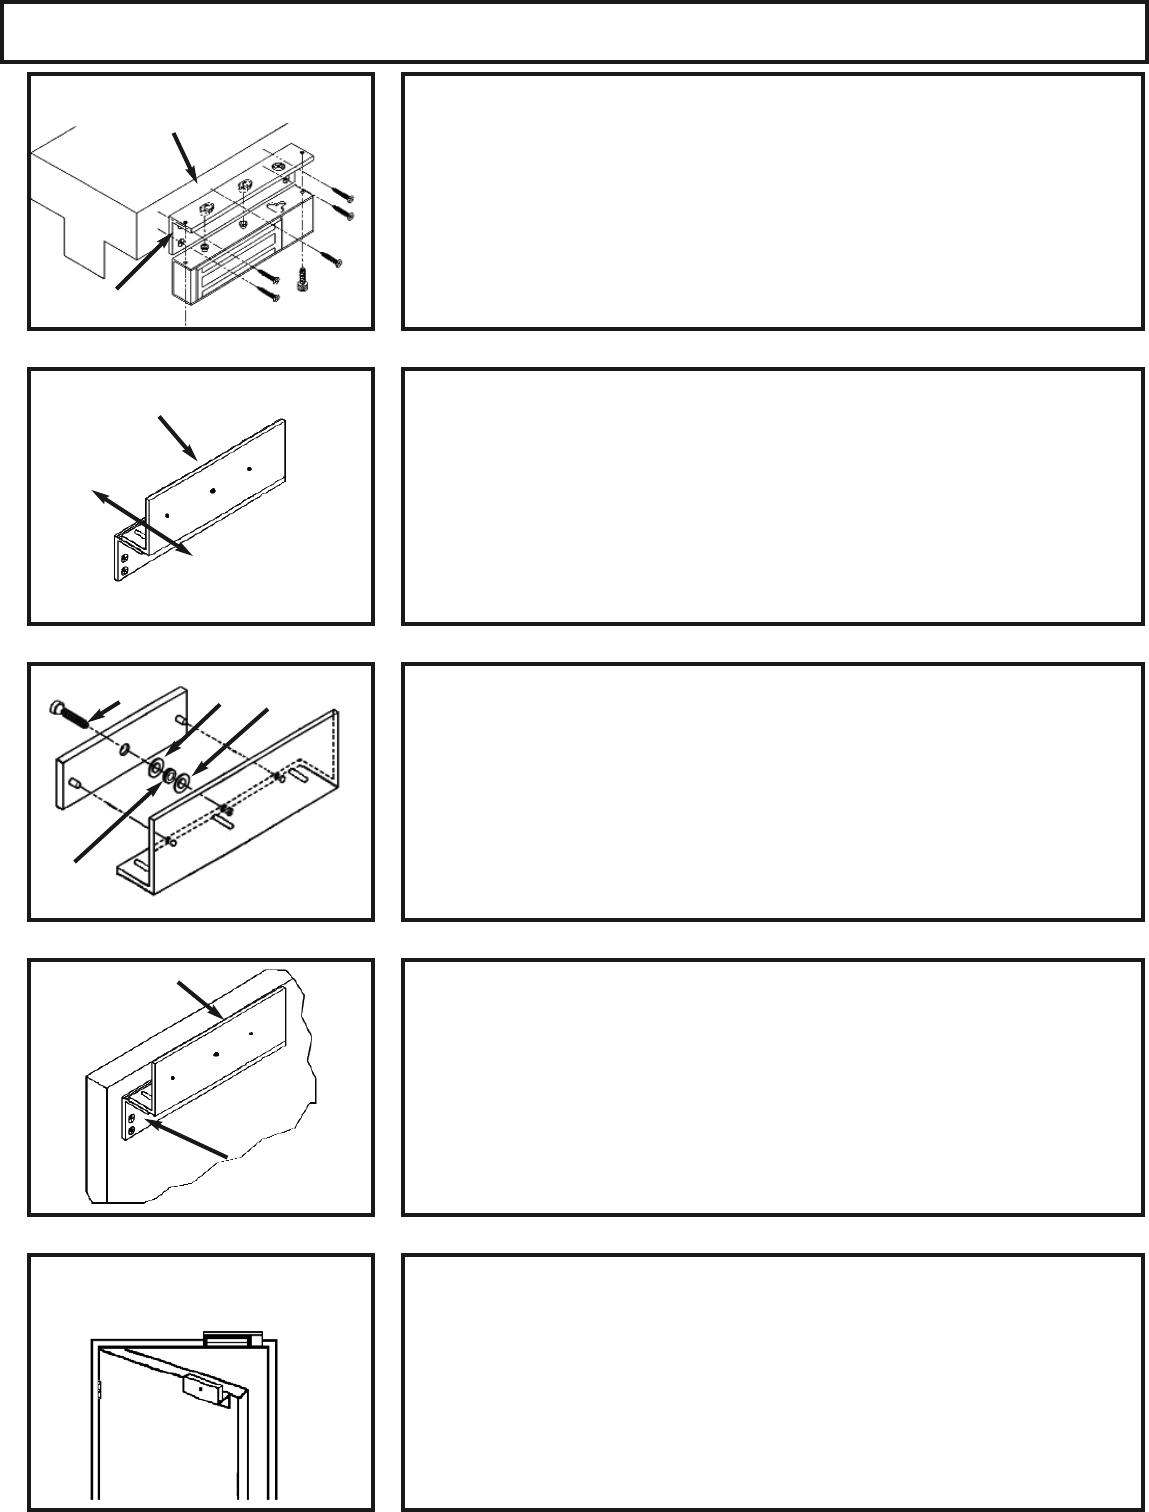 hight resolution of inswinging door installation with l z bracket